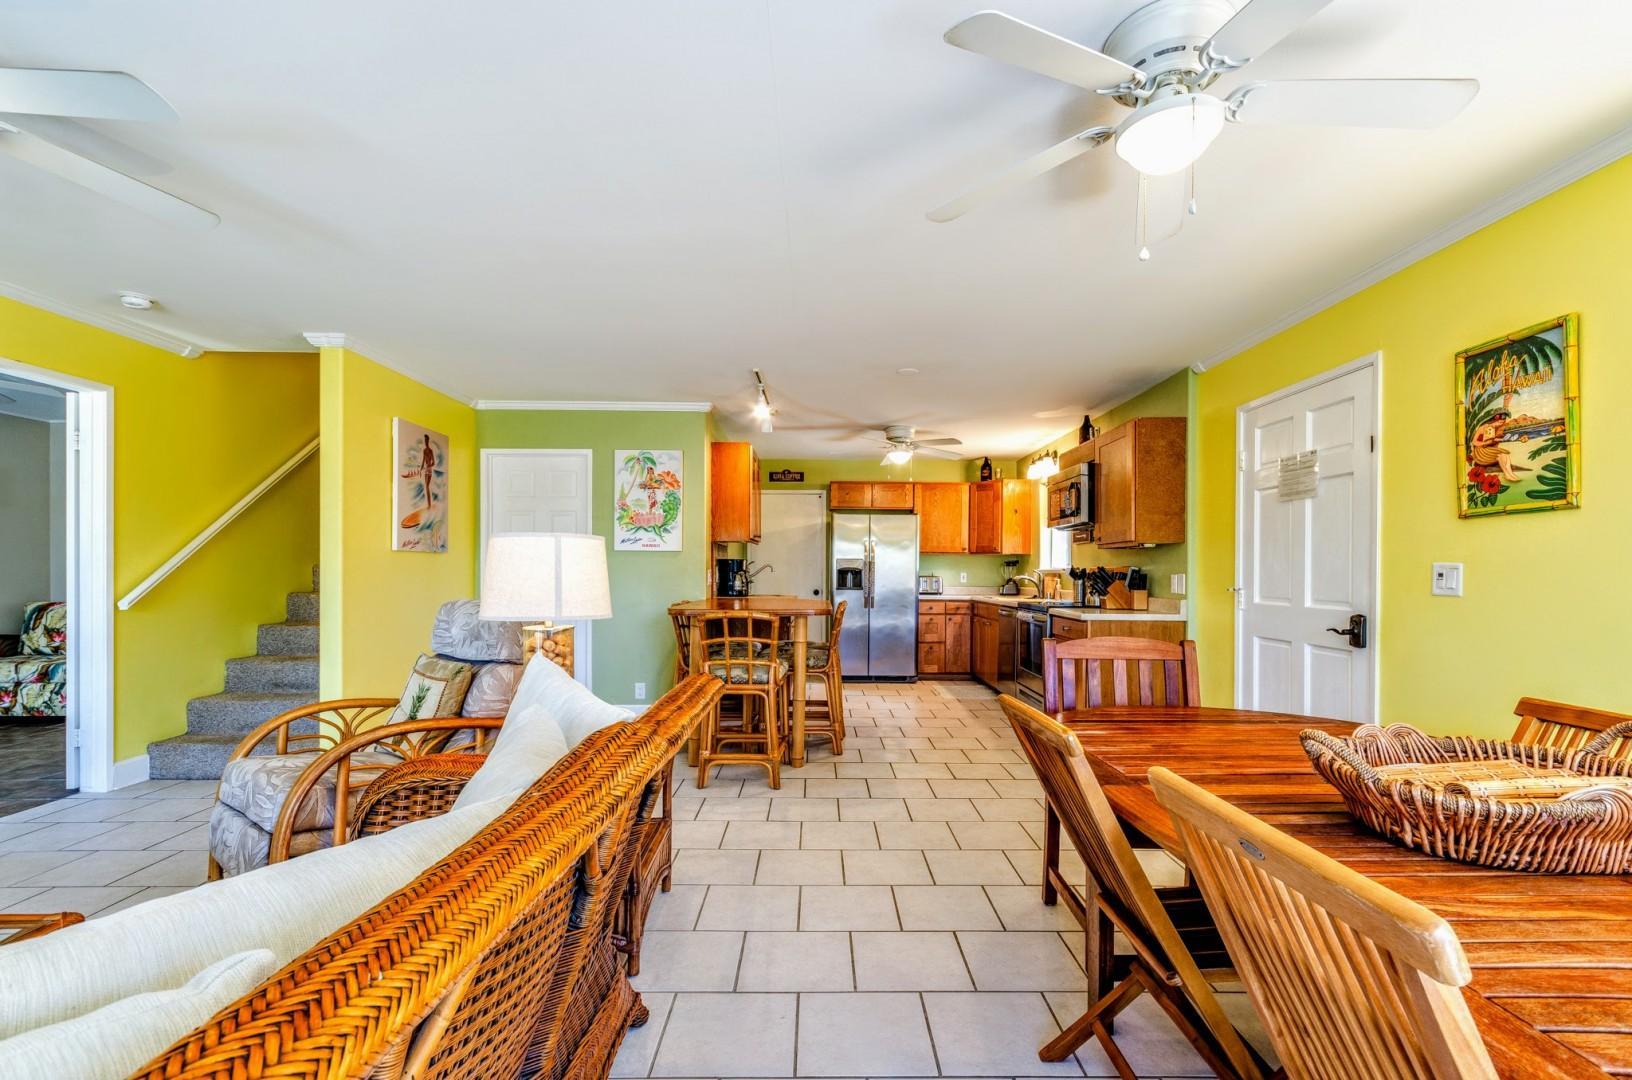 Open sightlines between the living room and kitchen